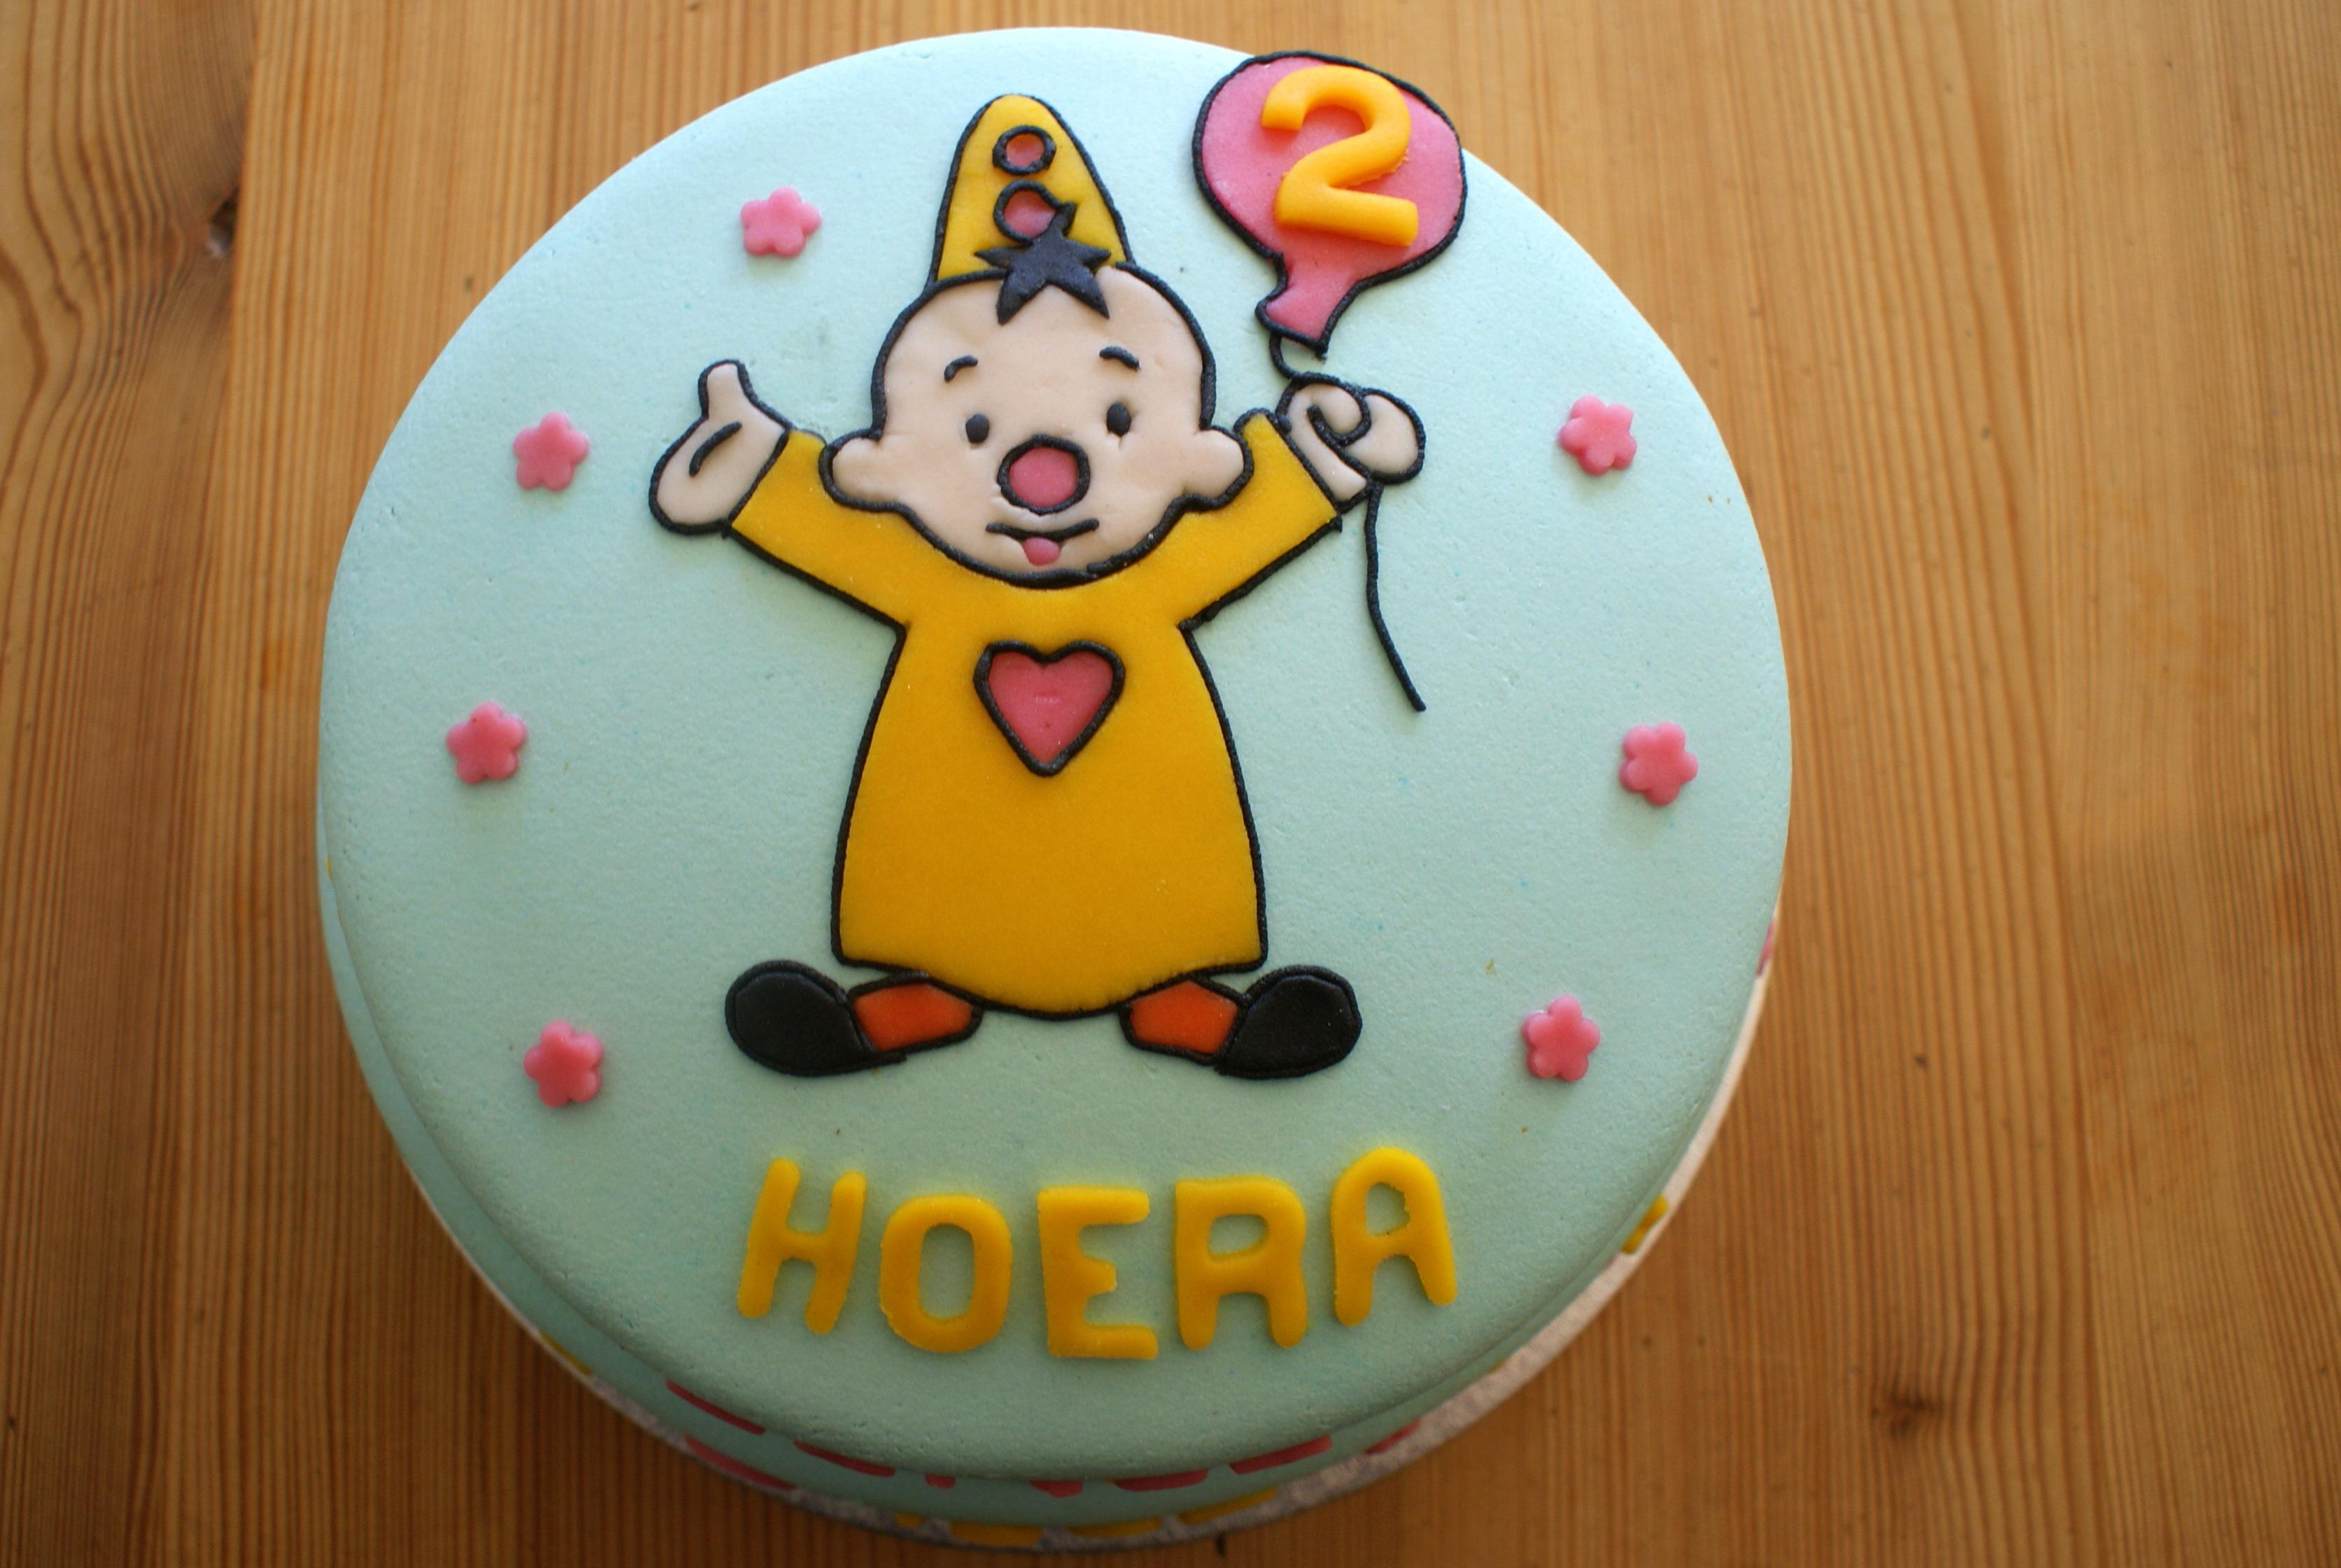 taart 2 jaar Verjaardagstaart Kind 2 Jaar   ARCHIDEV taart 2 jaar